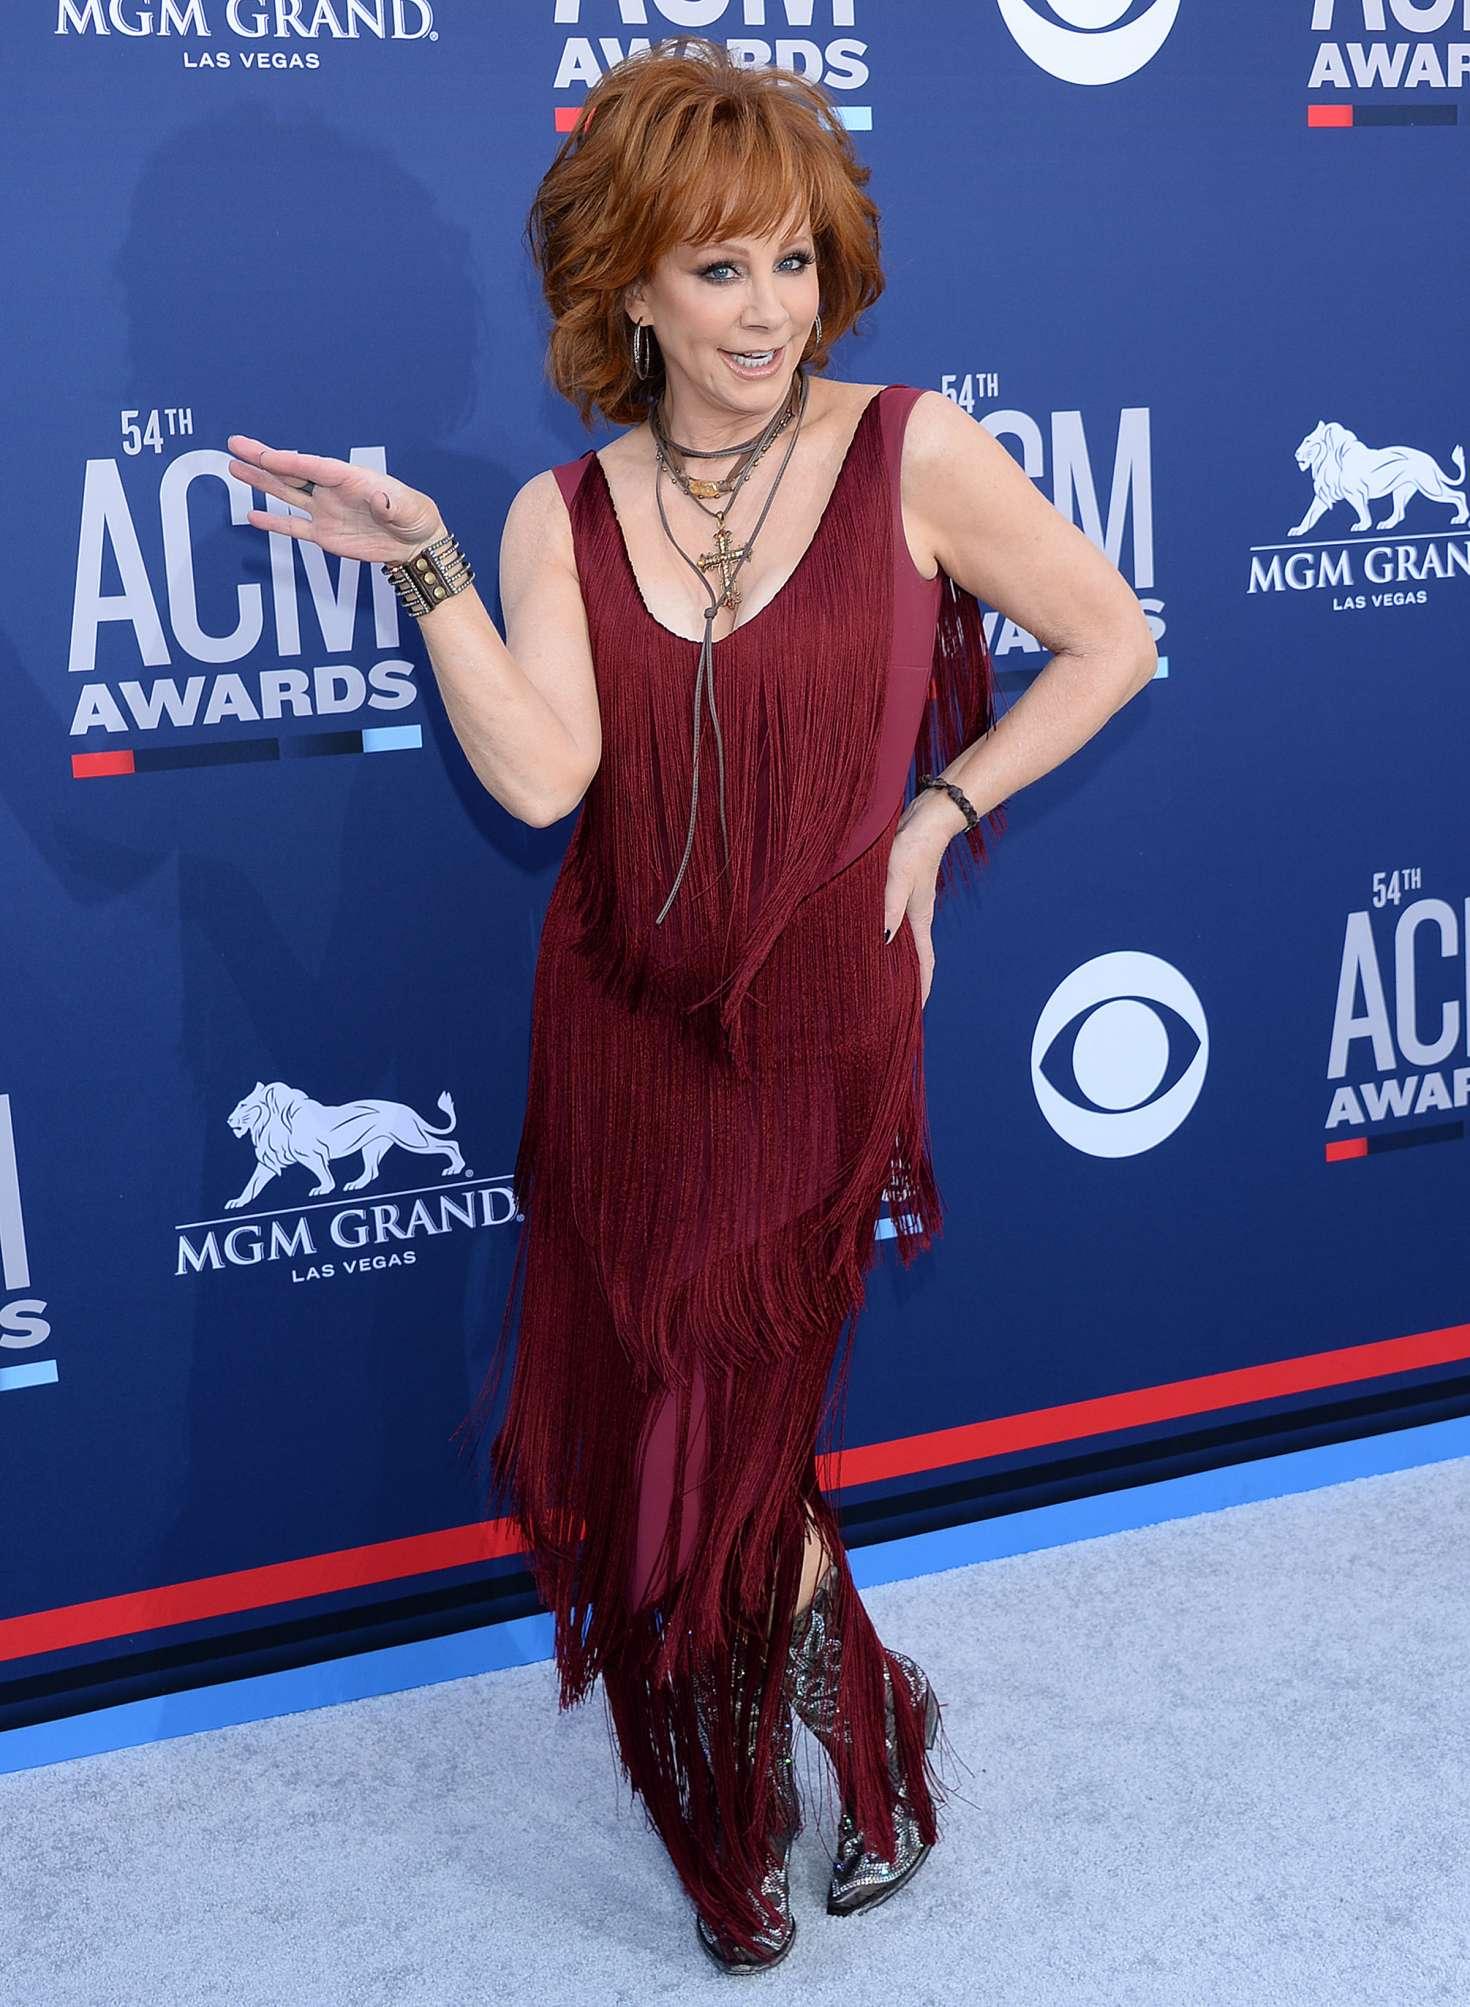 Reba Mcentire 2019 : Reba McEntire: 2019 Academy of Country Music Awards -10